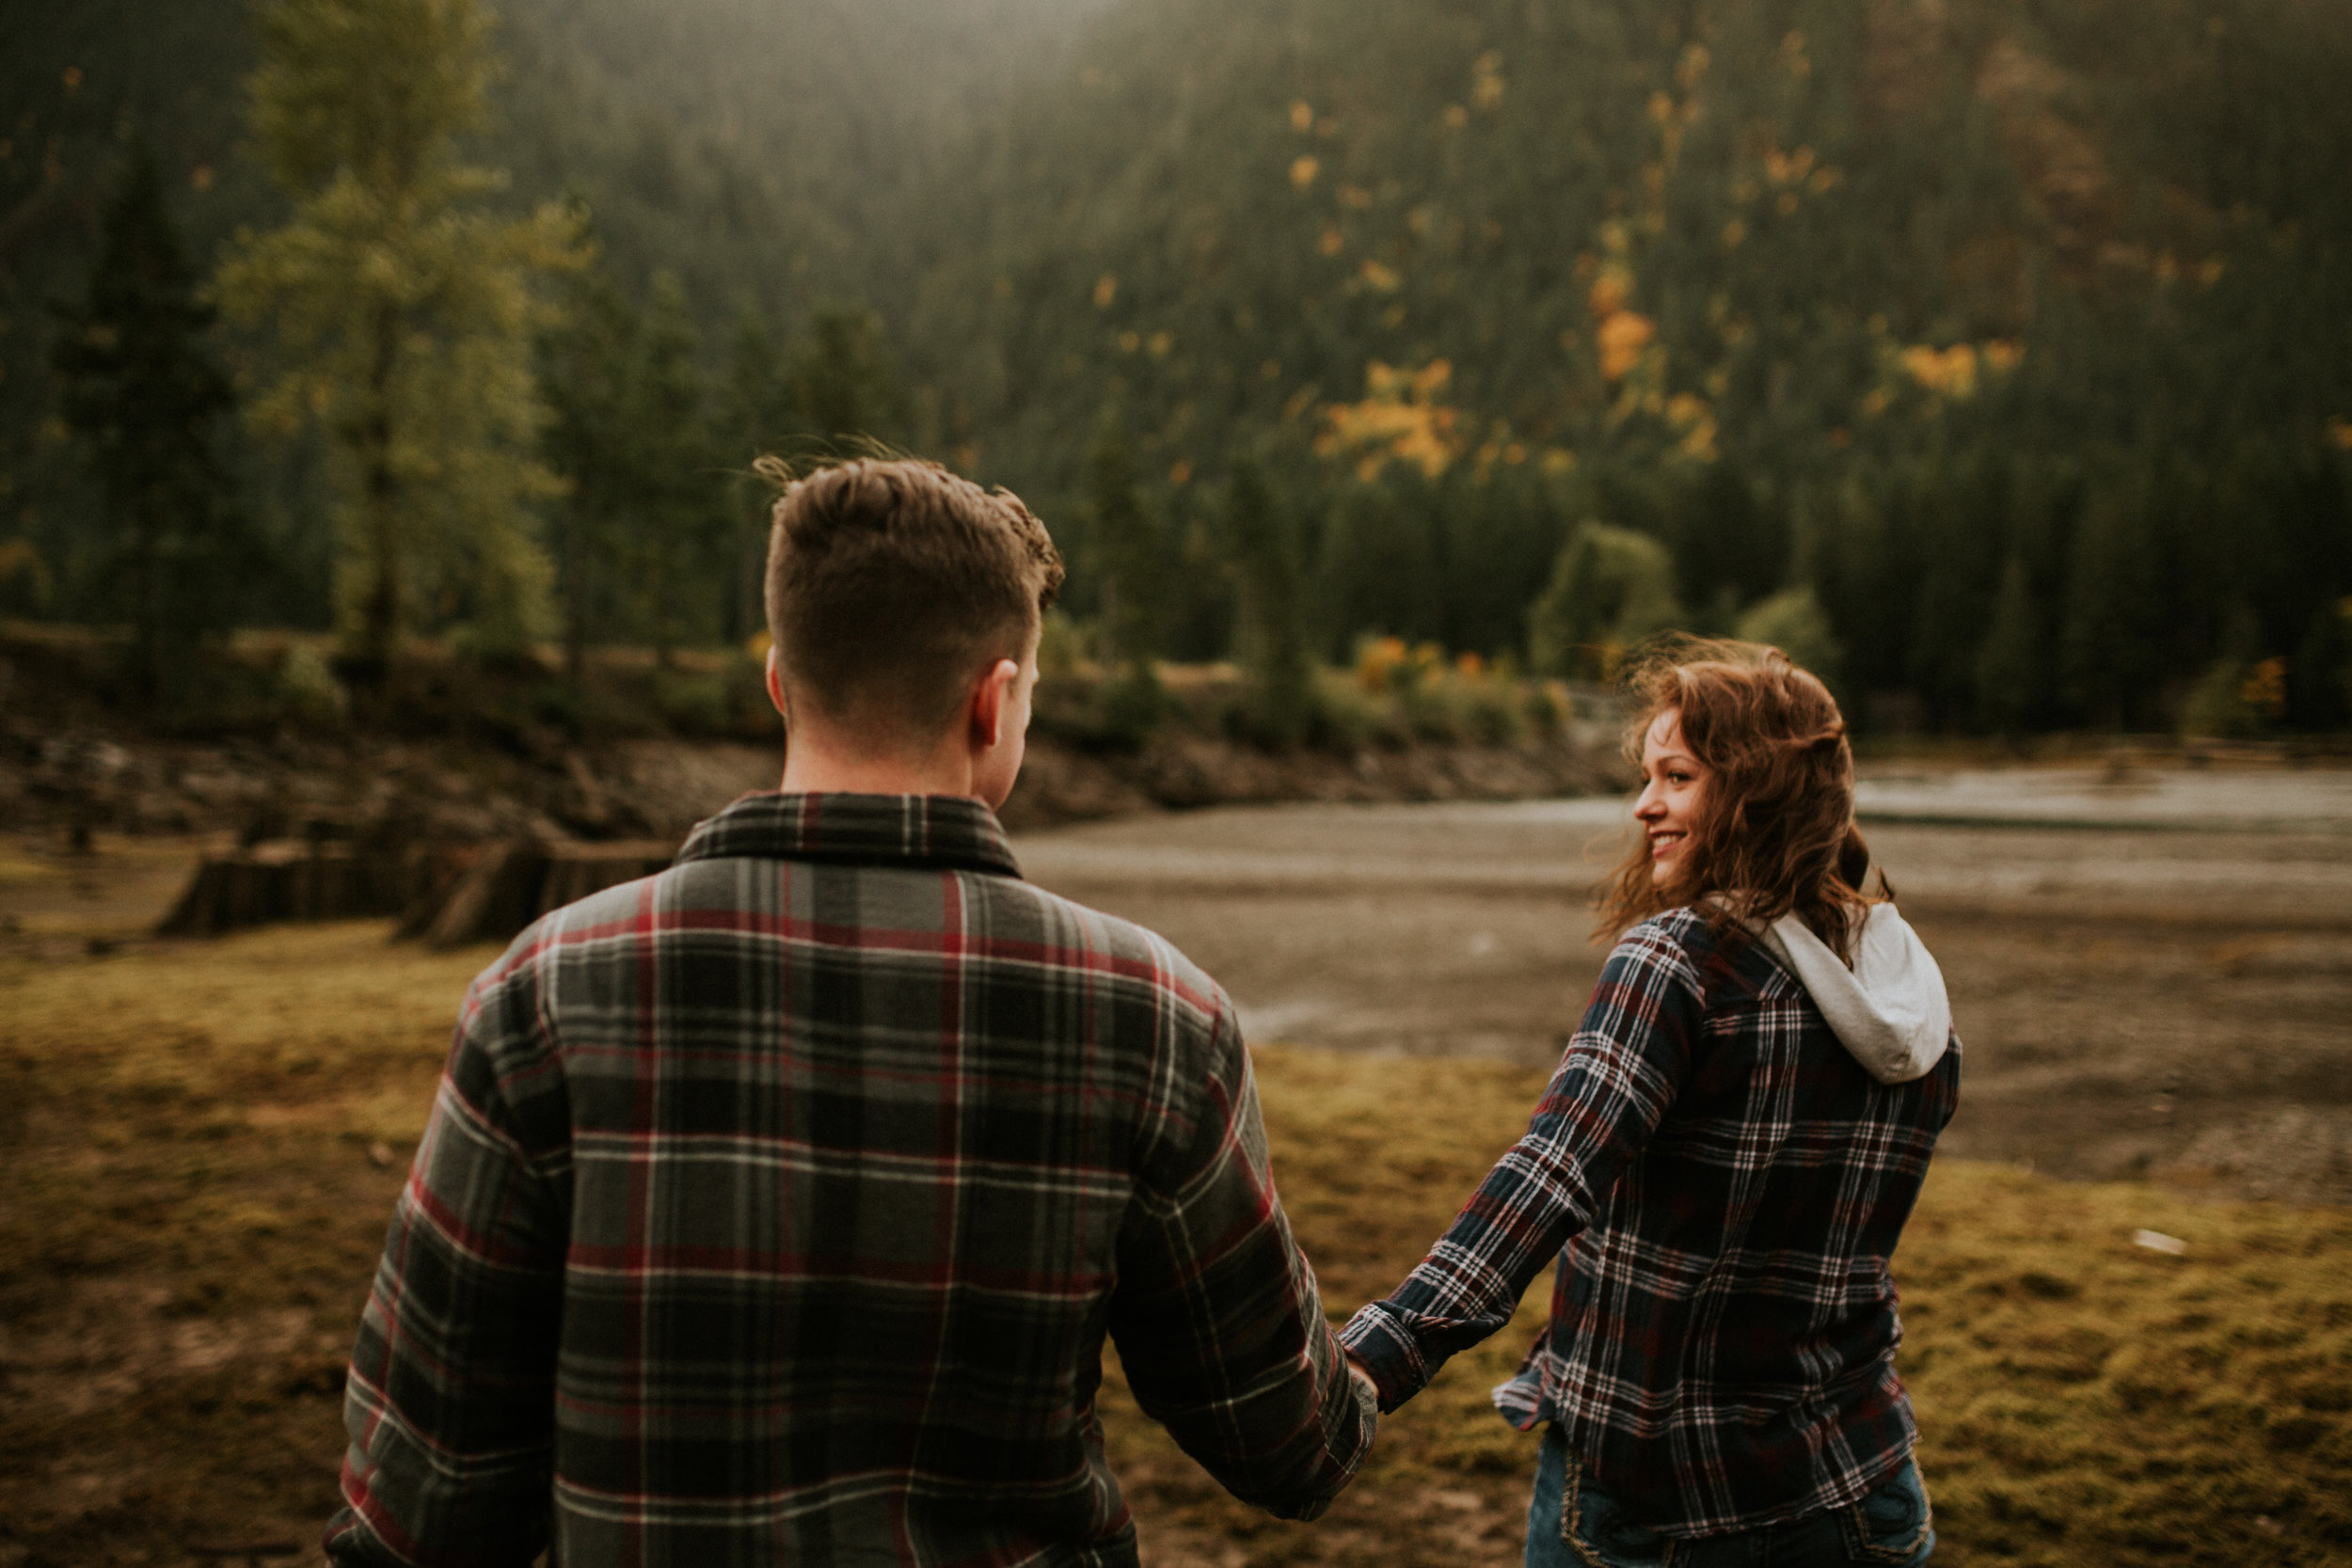 Lake-Cushman-Adventure-Engagement-photographer-breeanna-lasher-17.jpg